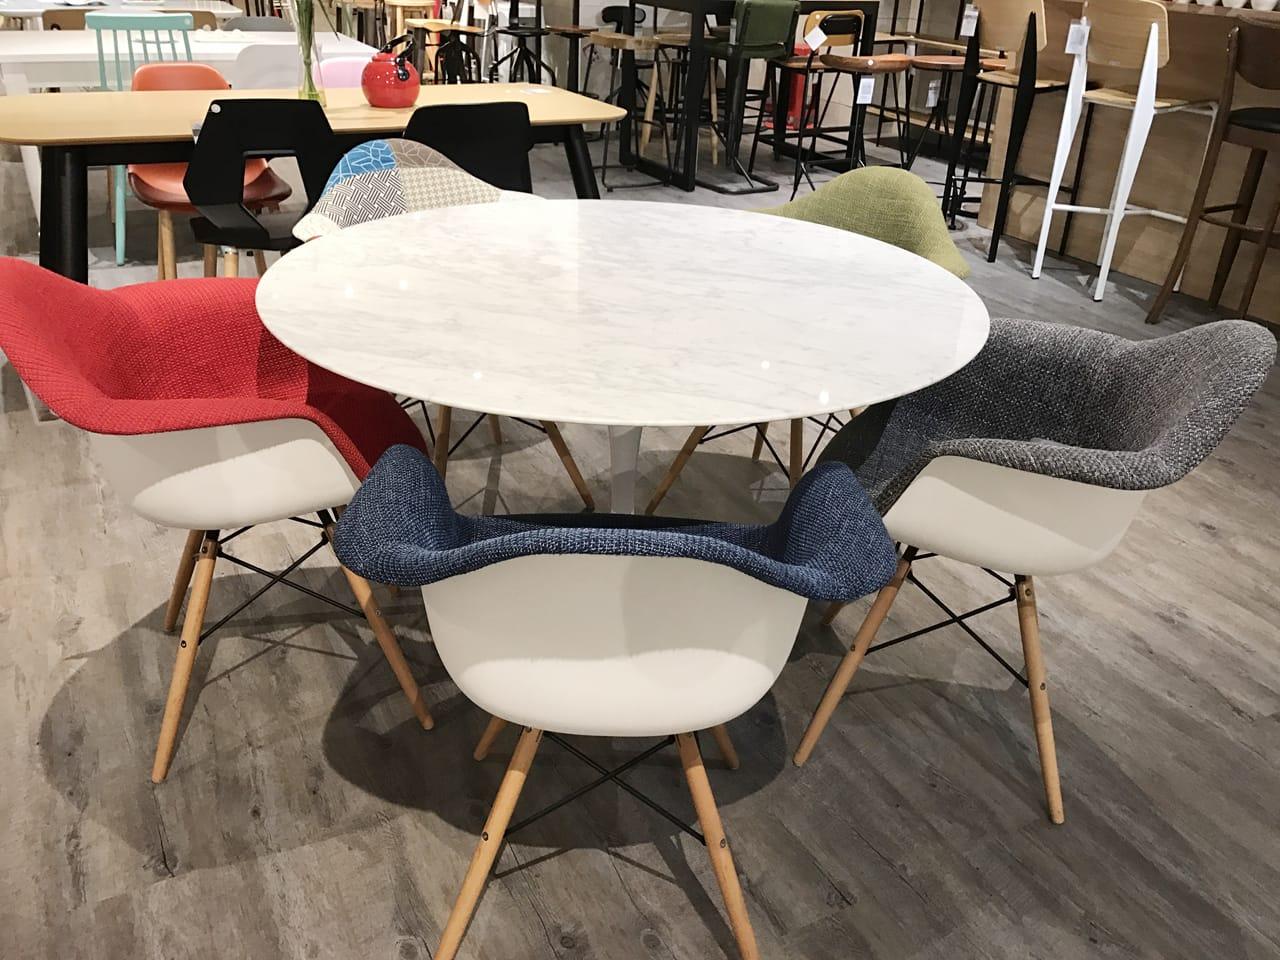 Tulip Dining Table Round Marble replica – Dia900